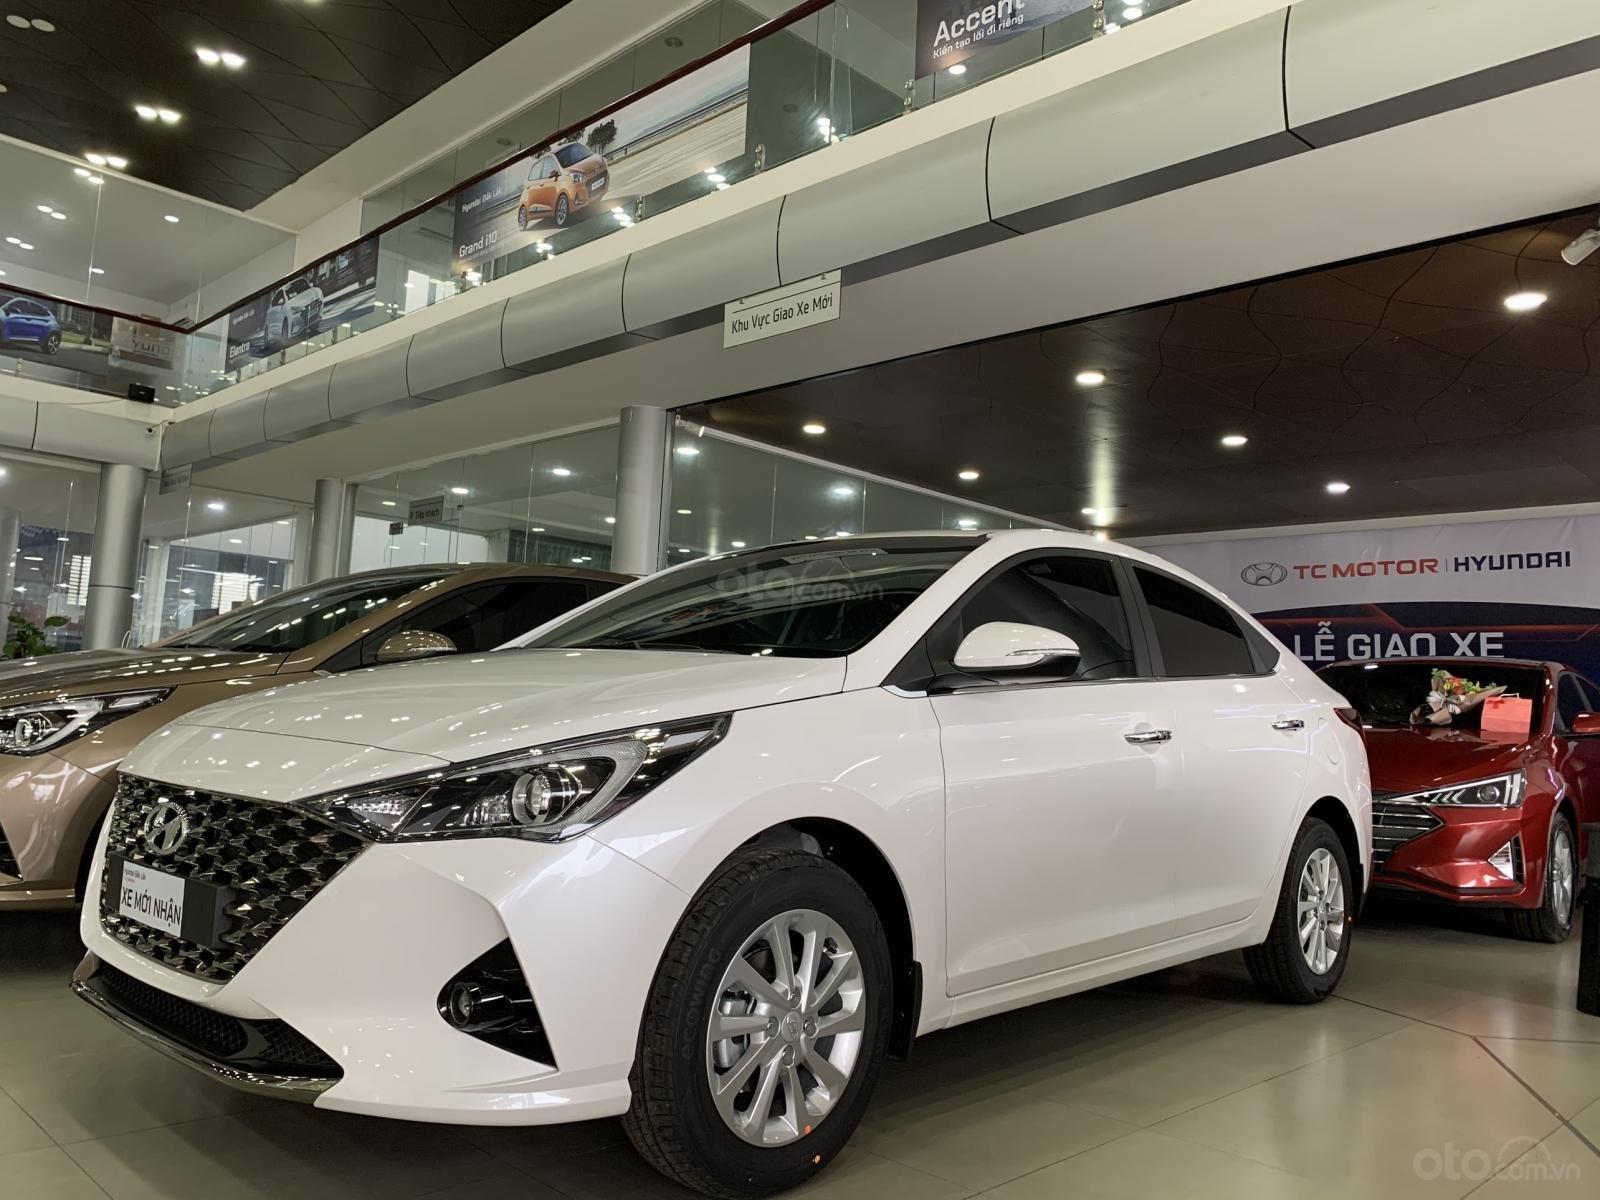 Daklak - Hyundai Accent 2021 MT (Facelift) giá chỉ 473tr (2)